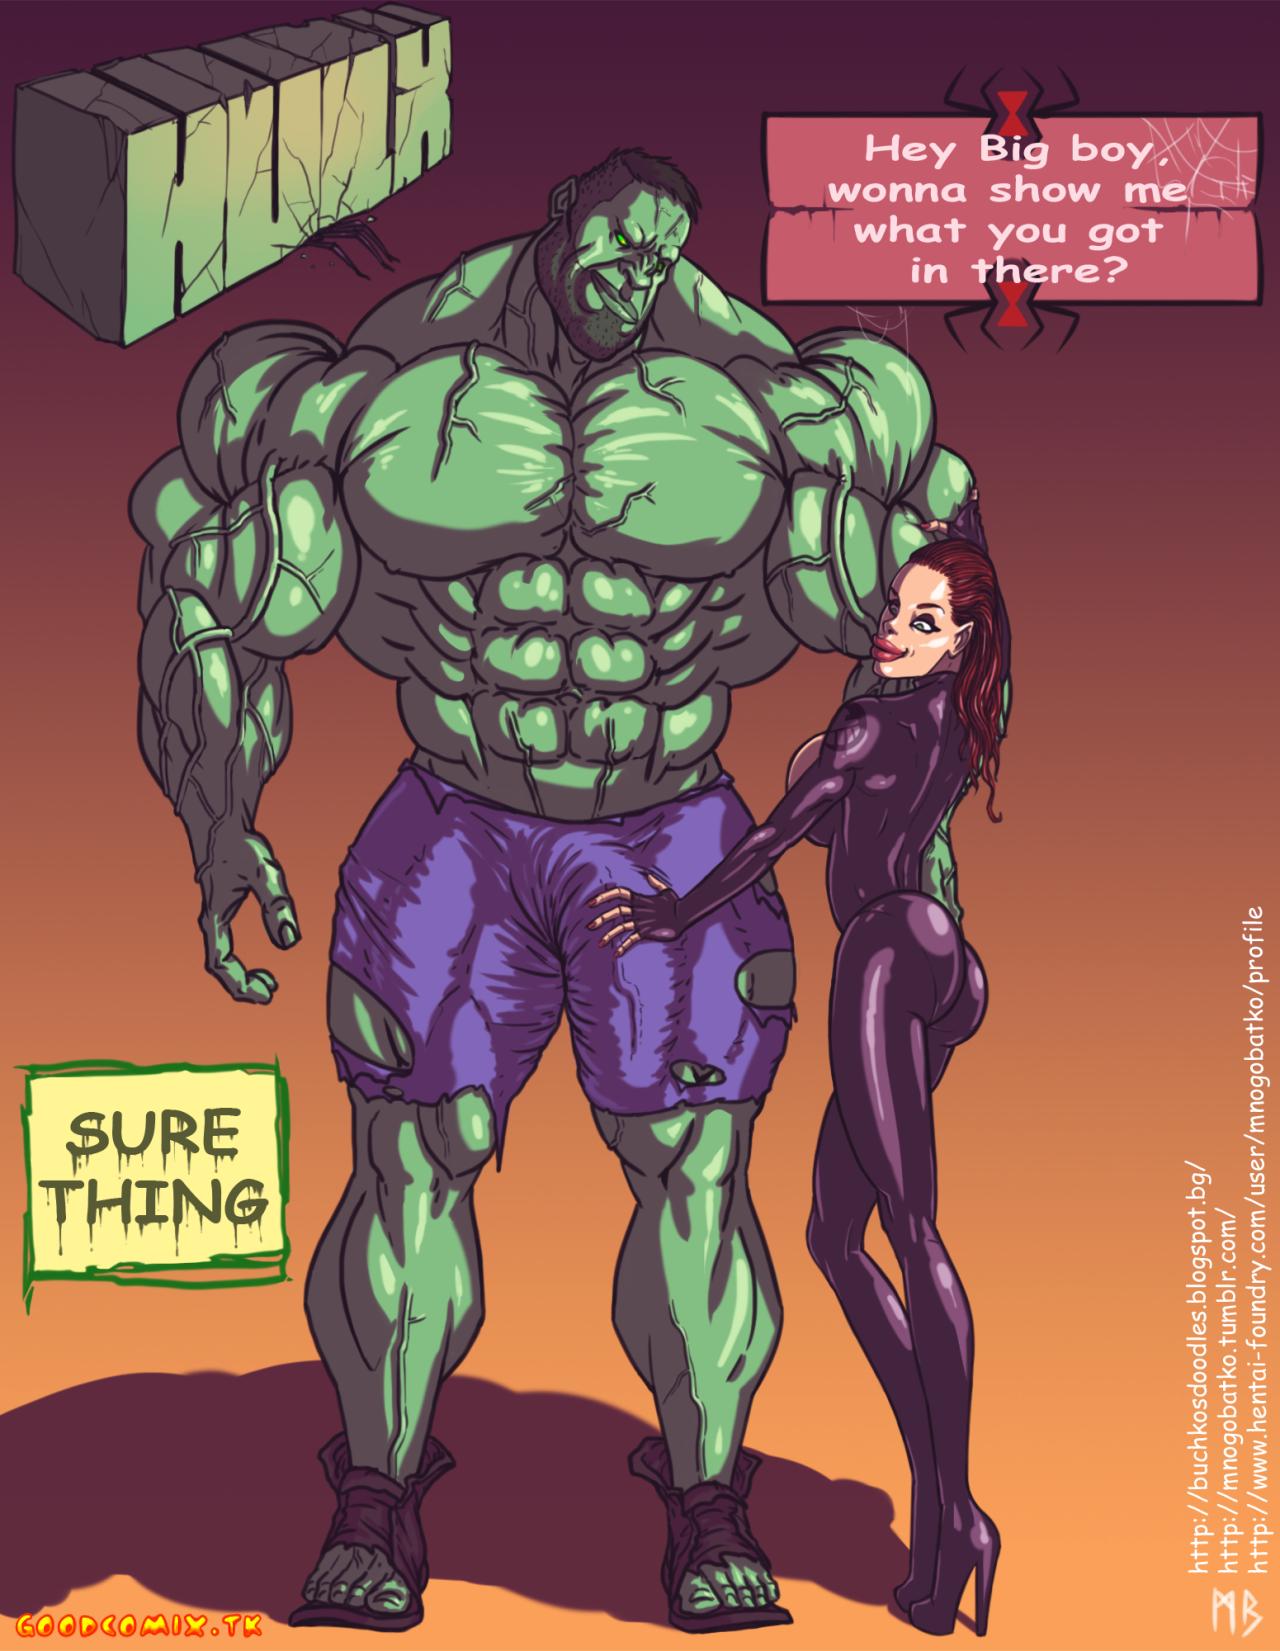 Goodcomix.tk The Avengers - [Mnogobatko] - Hulk vs Black Widow